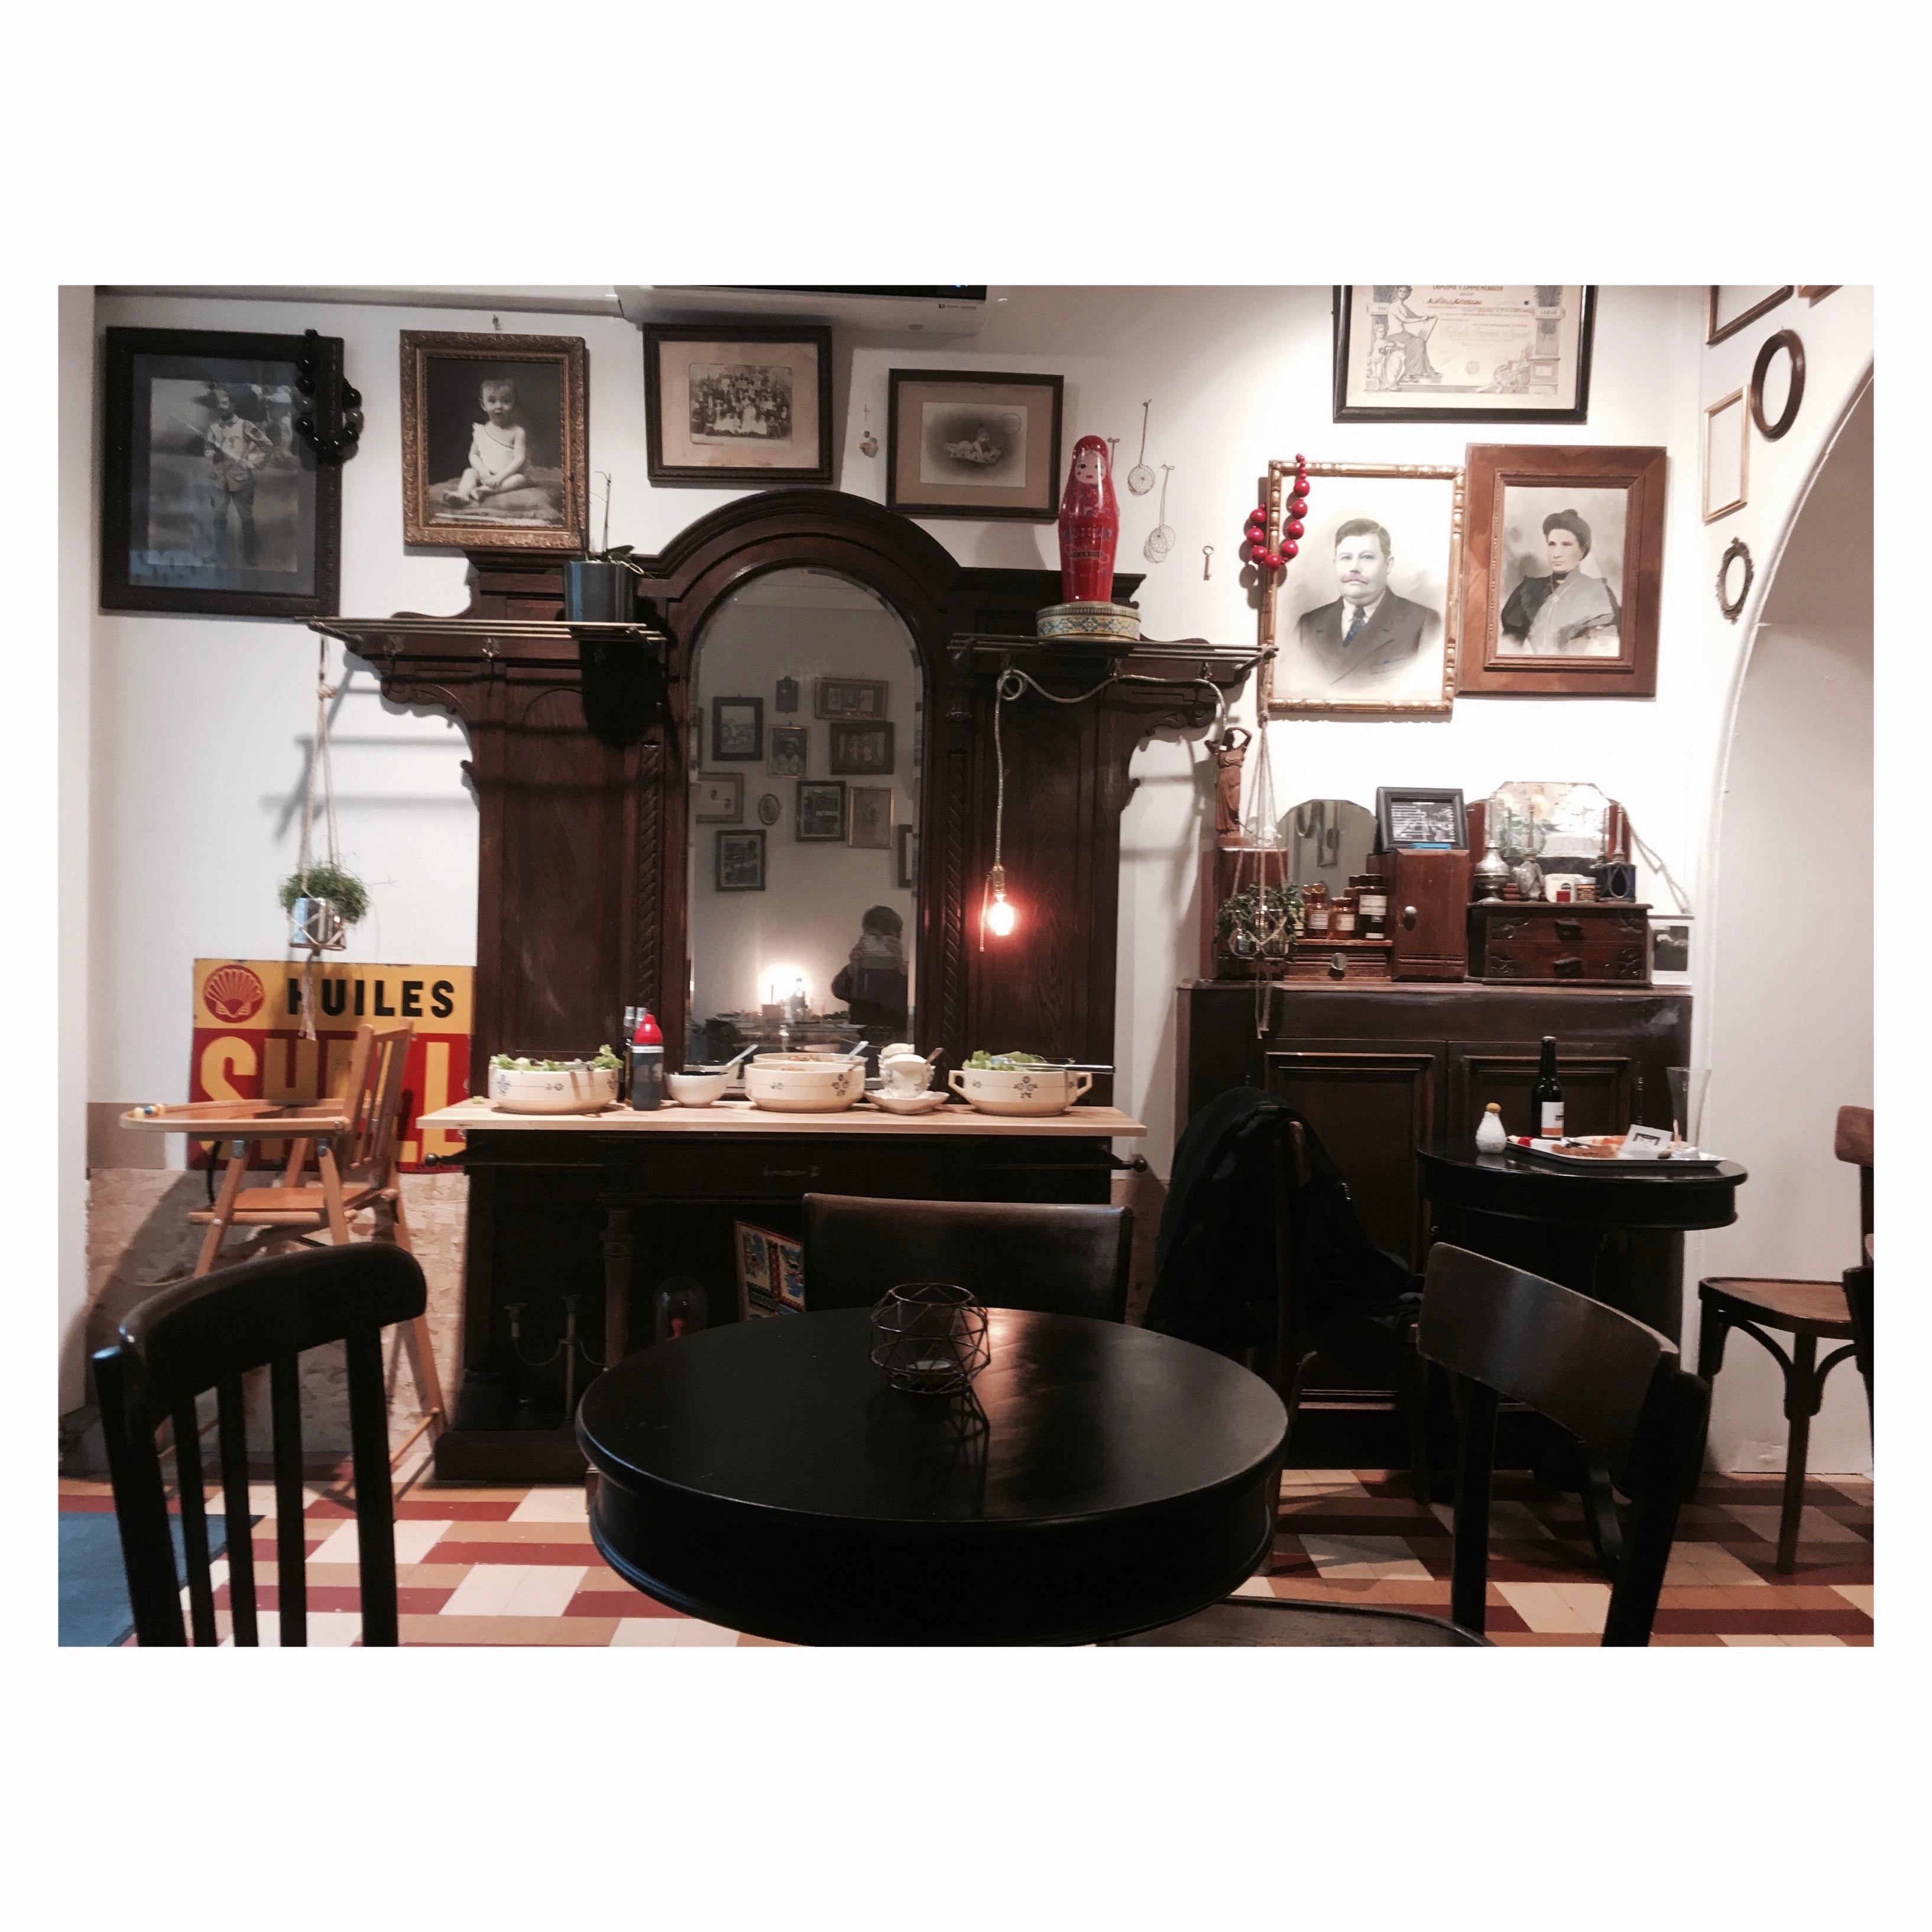 blog chamalo tourcoing restaurant cantine d co delfour charlotte. Black Bedroom Furniture Sets. Home Design Ideas